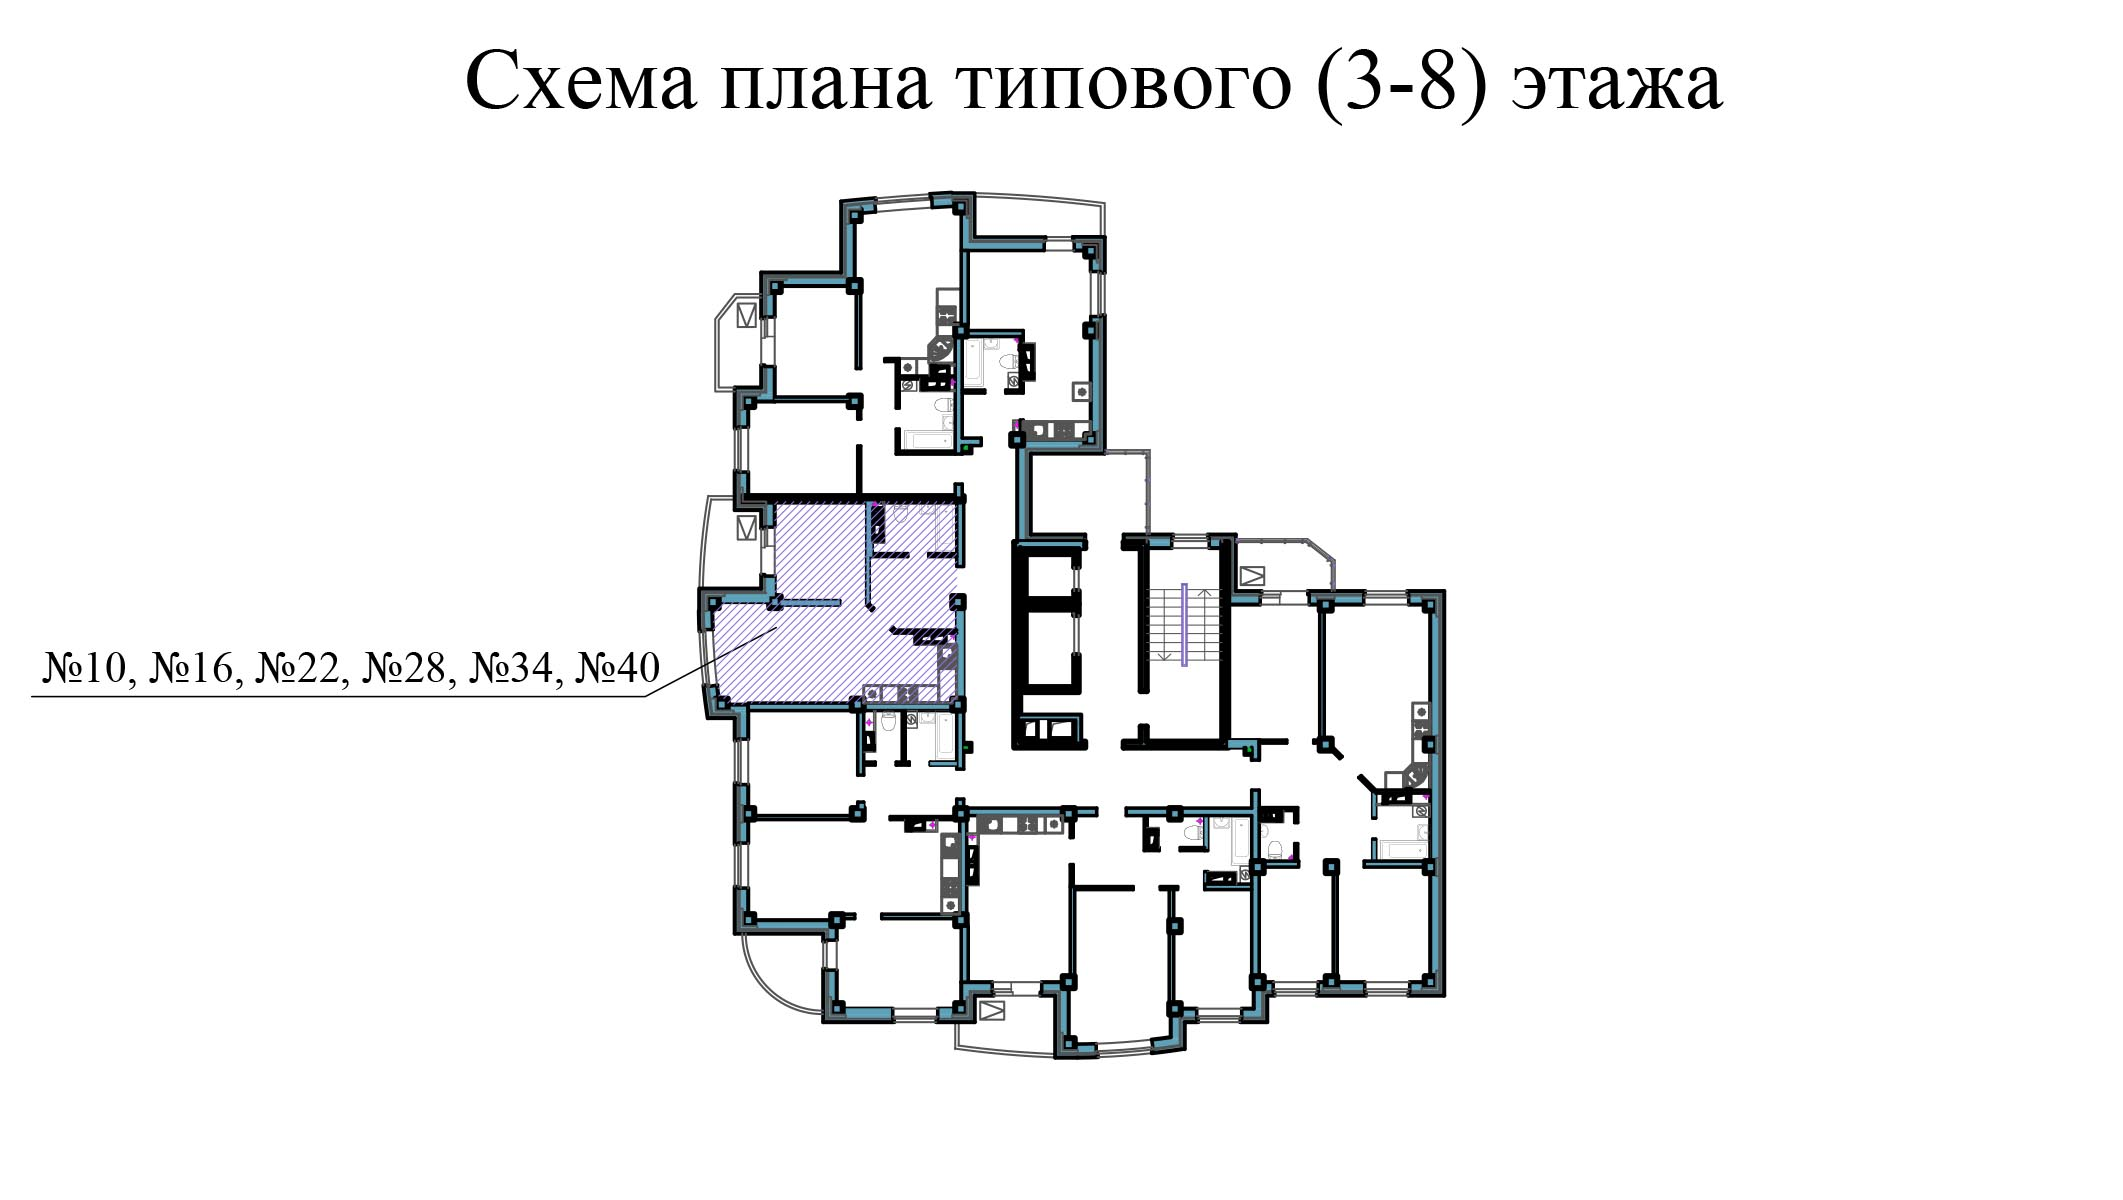 Однокомнатная квартира - ул.Балтийская, д. 1а, кв. 22